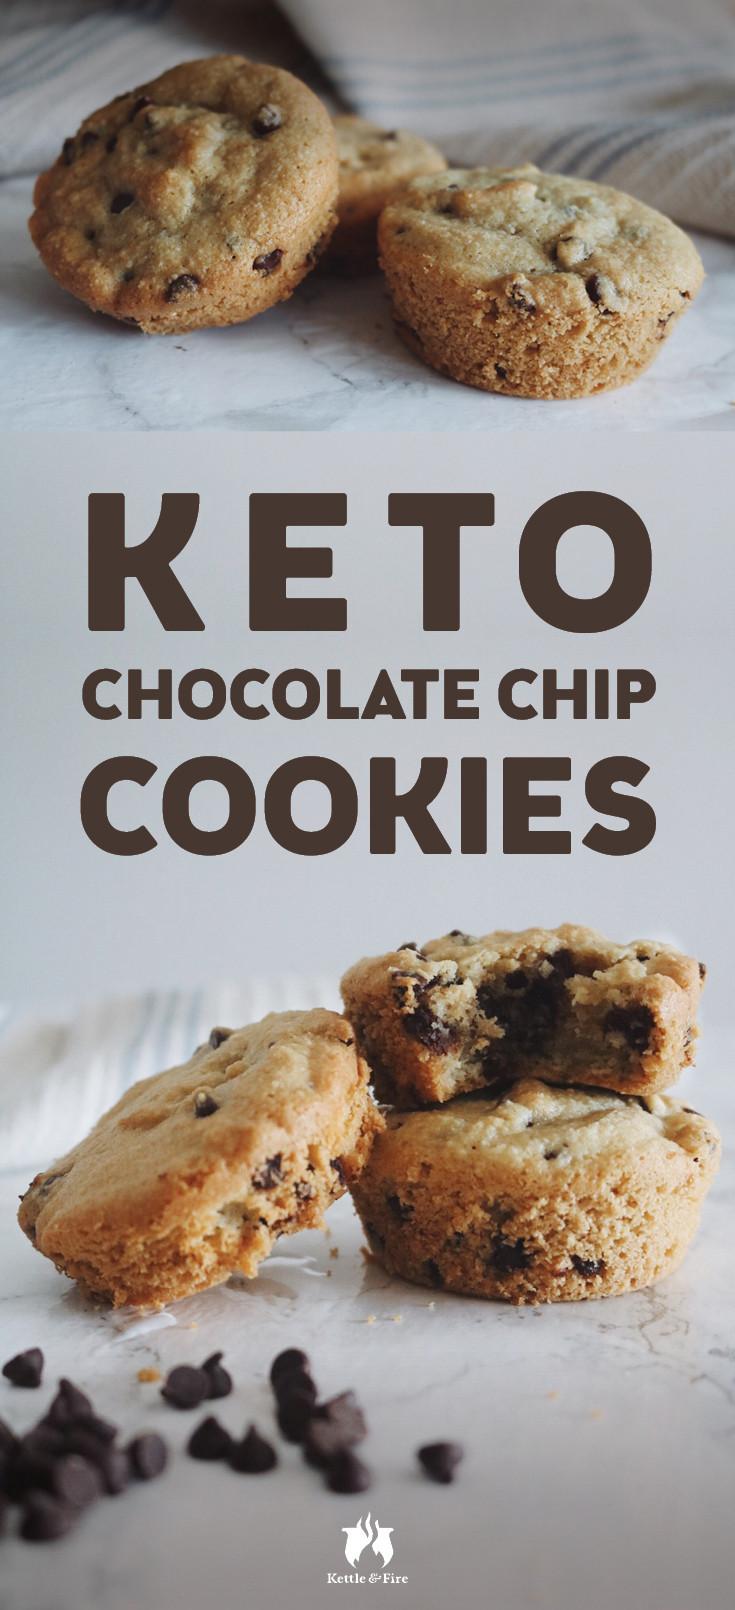 Keto Cookies Recipe  Keto Chocolate Chip Cookies